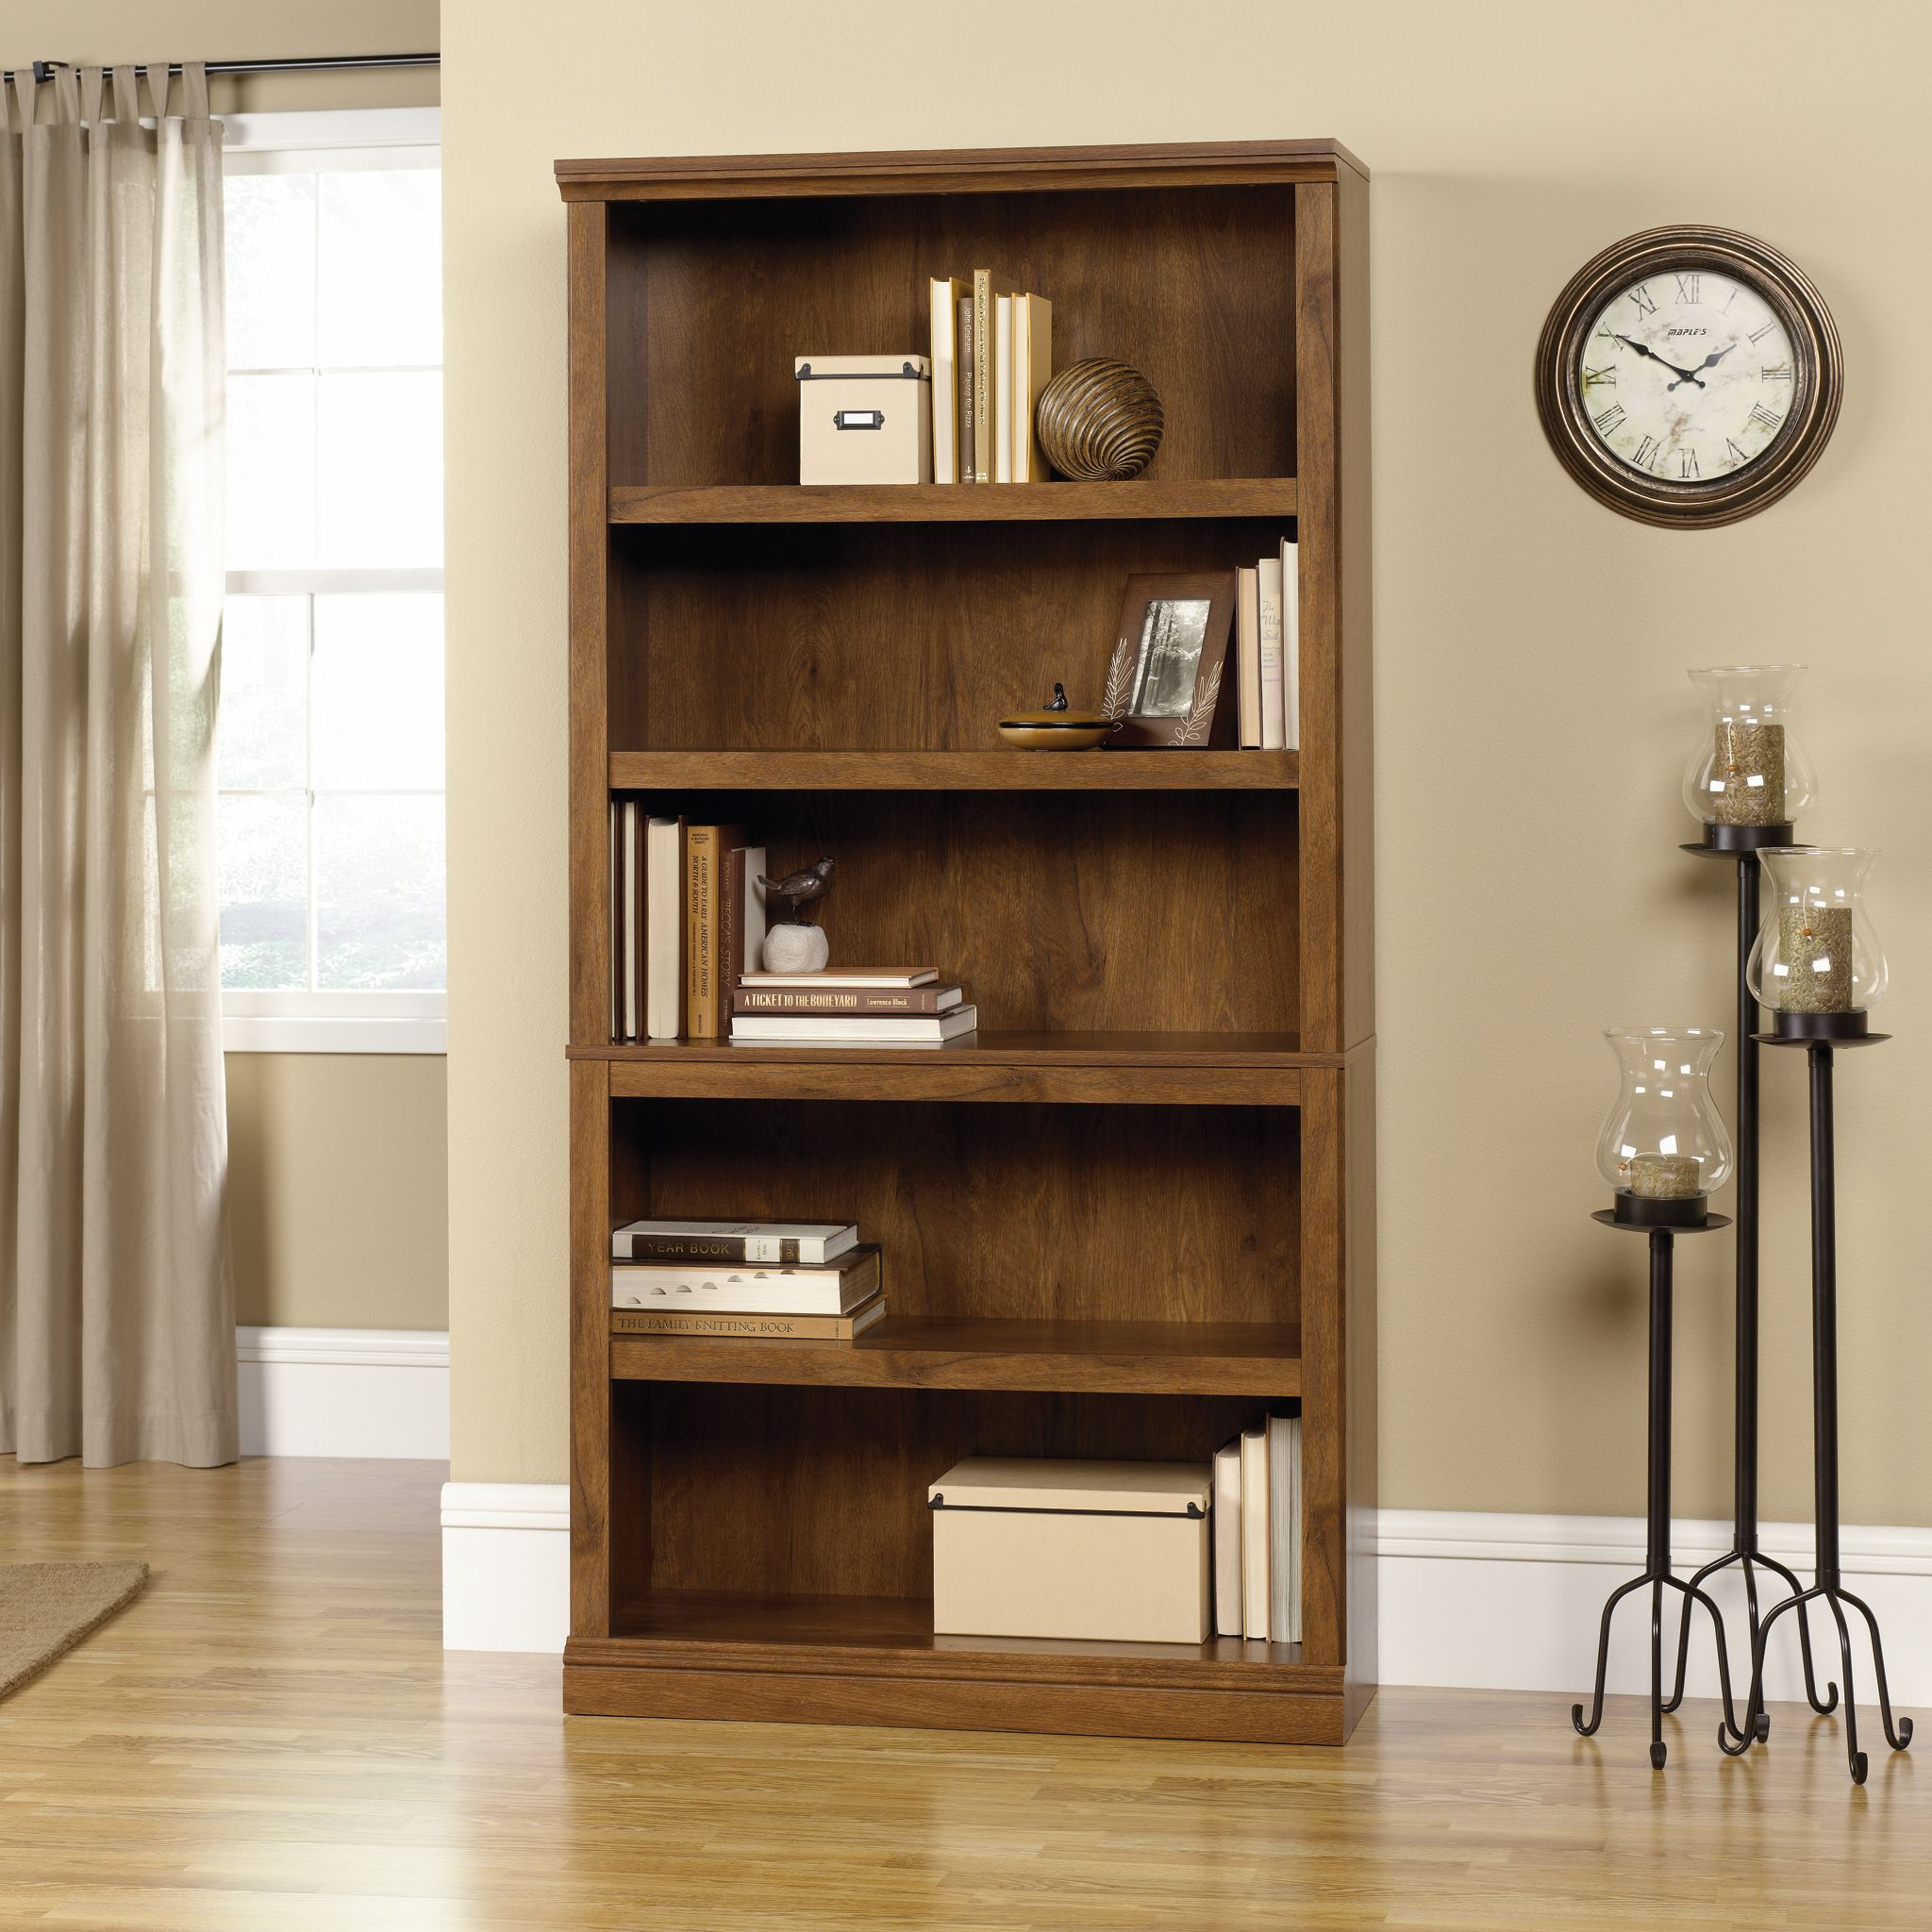 Home Straightforward Adjustable 3/ 4 Shelf Bookcase Storage Bookshelf Wood Furniture Book Shelving 4 Color For Choose